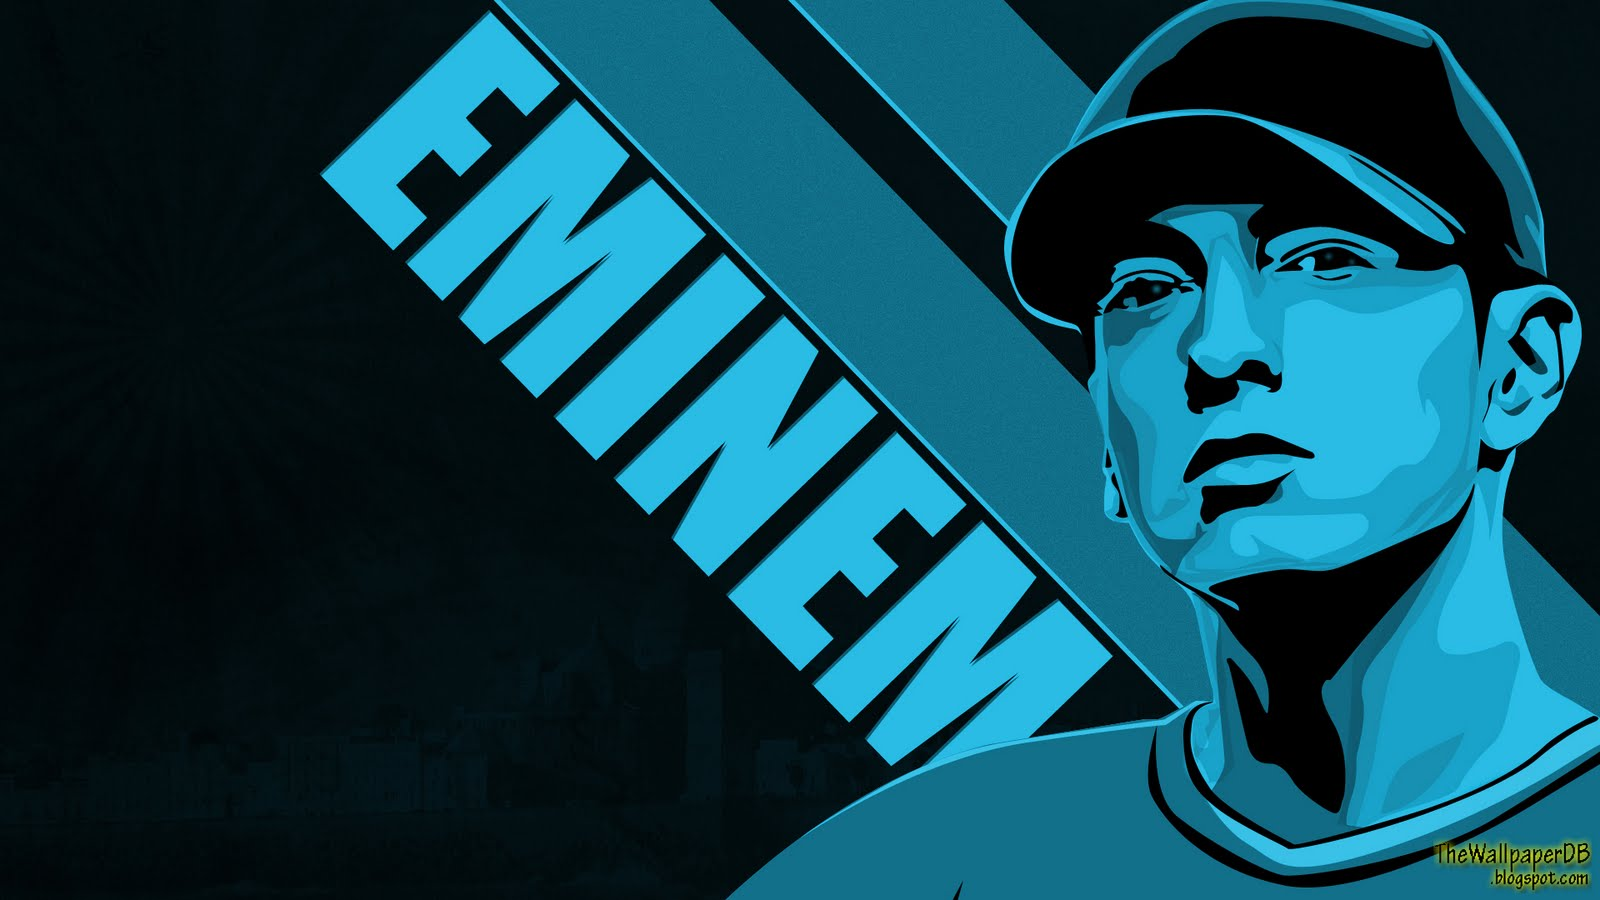 http://3.bp.blogspot.com/-zvjR3xDFIlk/TbczZw8giKI/AAAAAAAAAZg/Ofa7s9DNi3M/s1600/TheWallpaperDB.blogspot.com___+___Eminem+%25281%2529.jpg